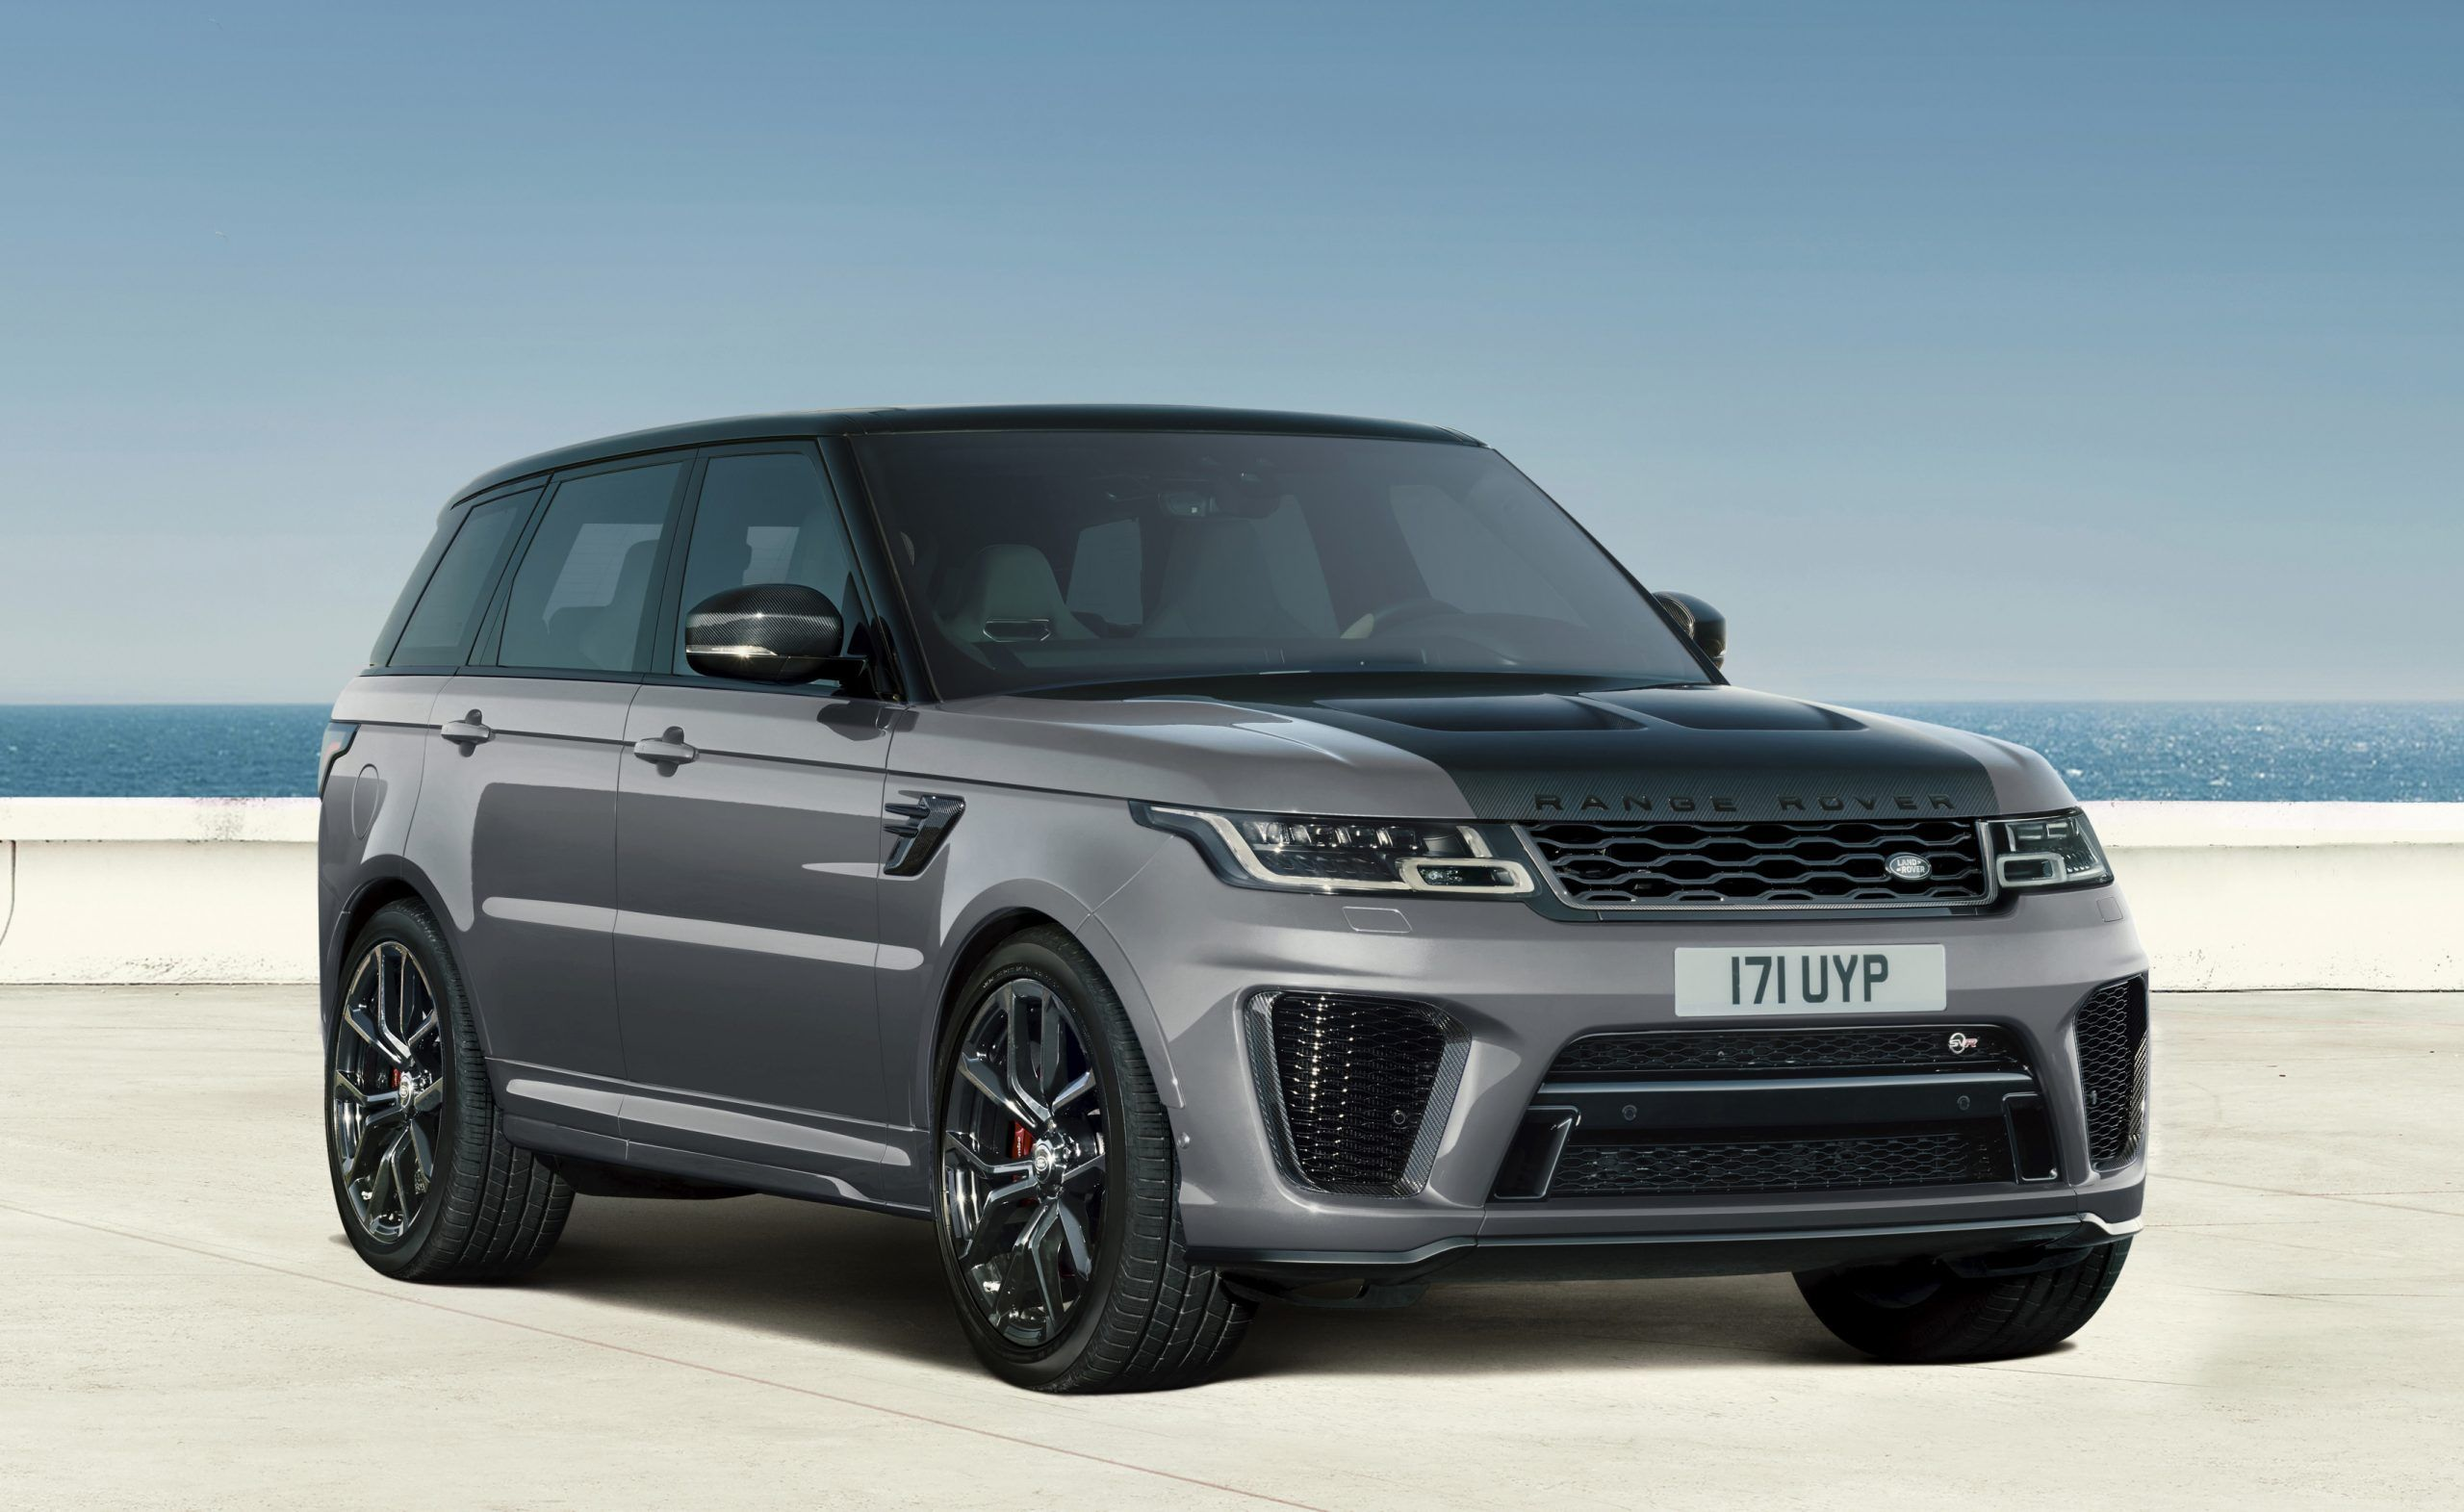 New Range Rover Sport SVR Carbon Edition Confirmed for